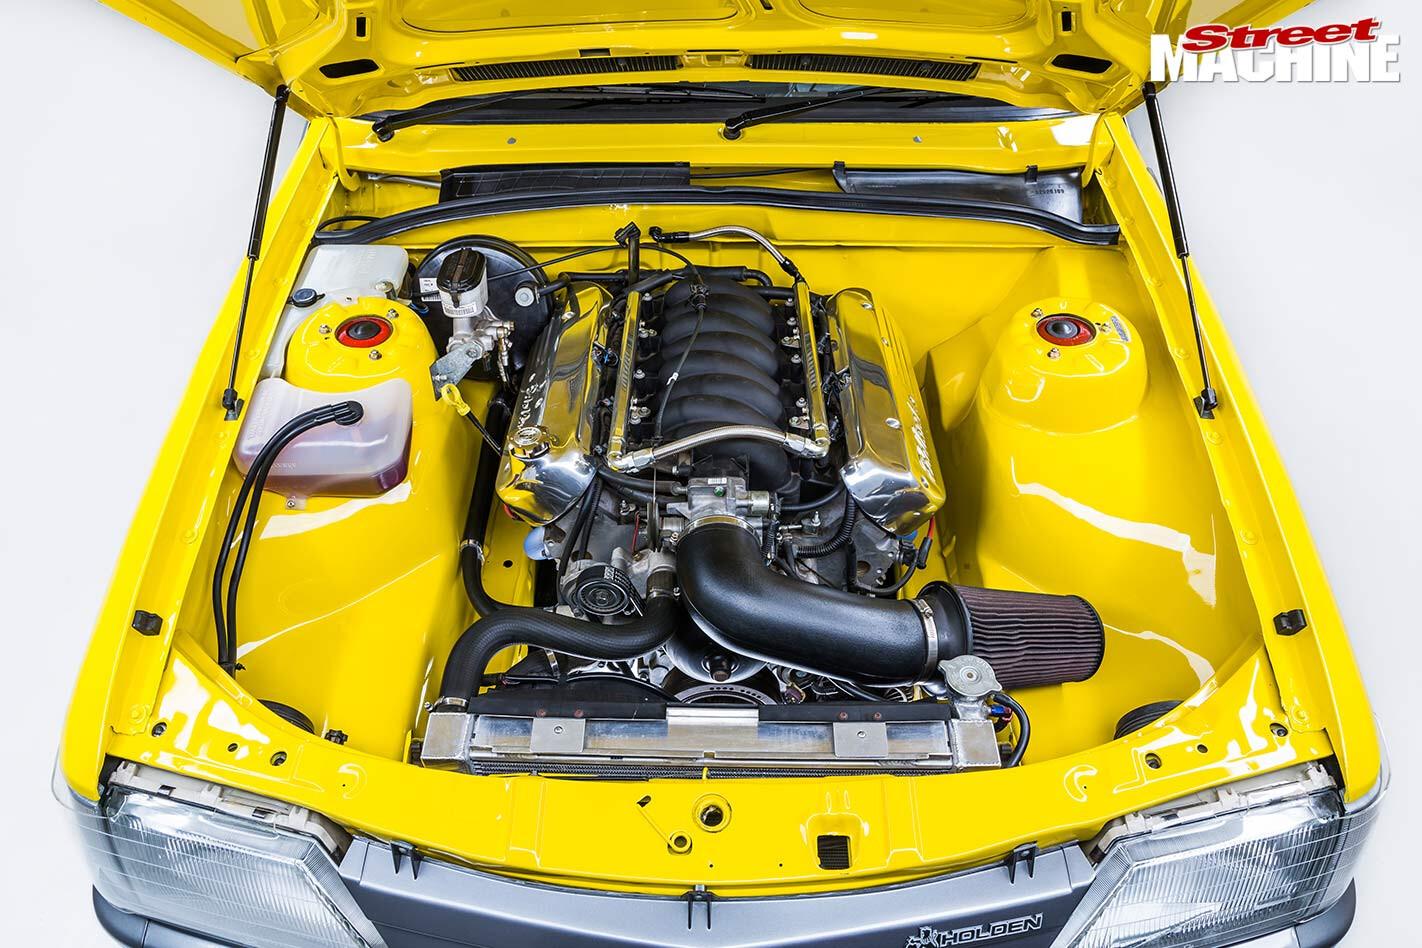 Holden VK Commodore engine bay